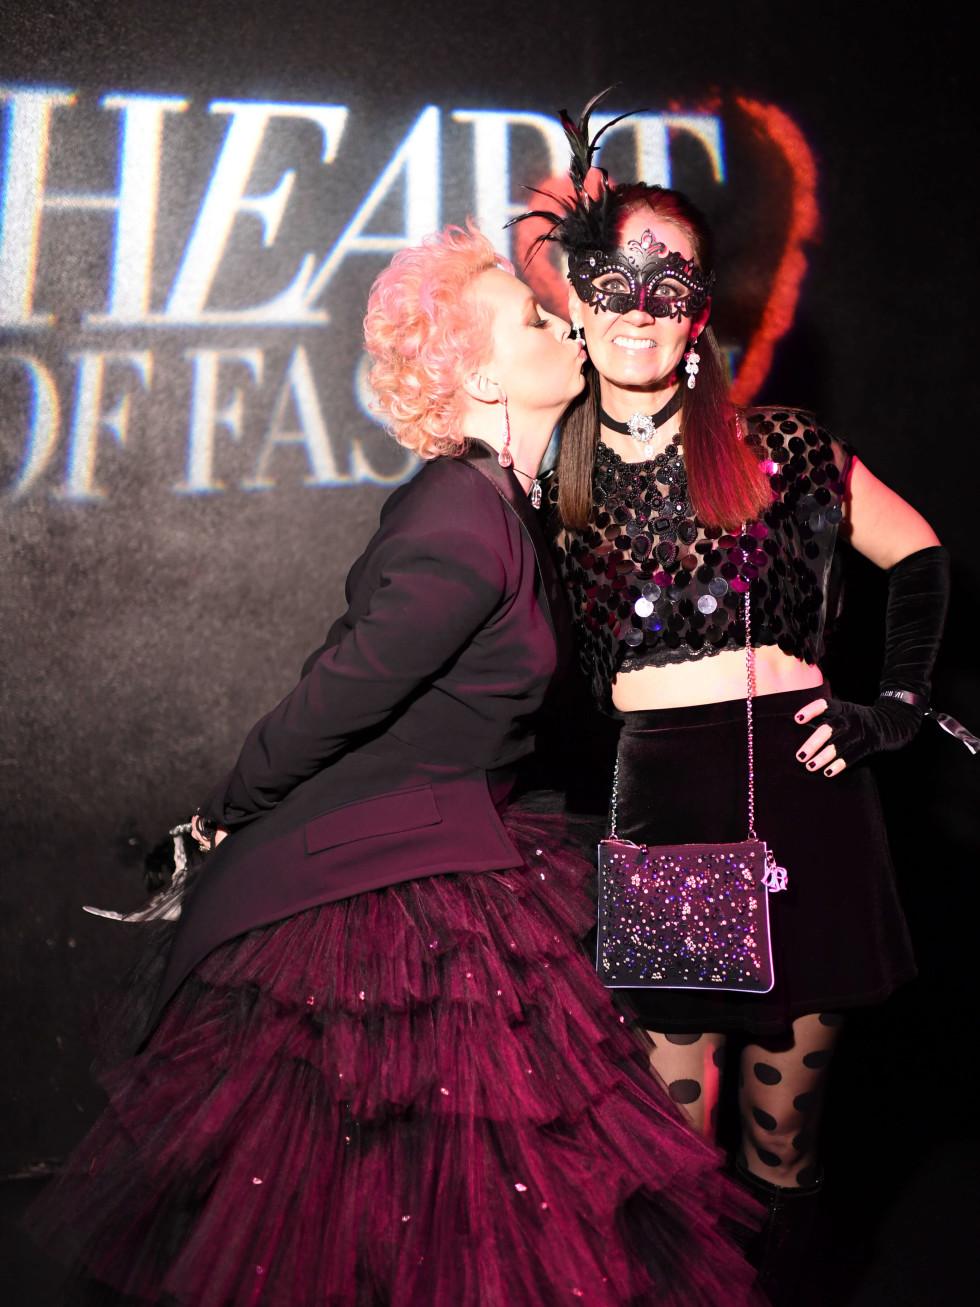 Heart of Fashion Masquerade Ball Vivian Wise, Beth Muecke